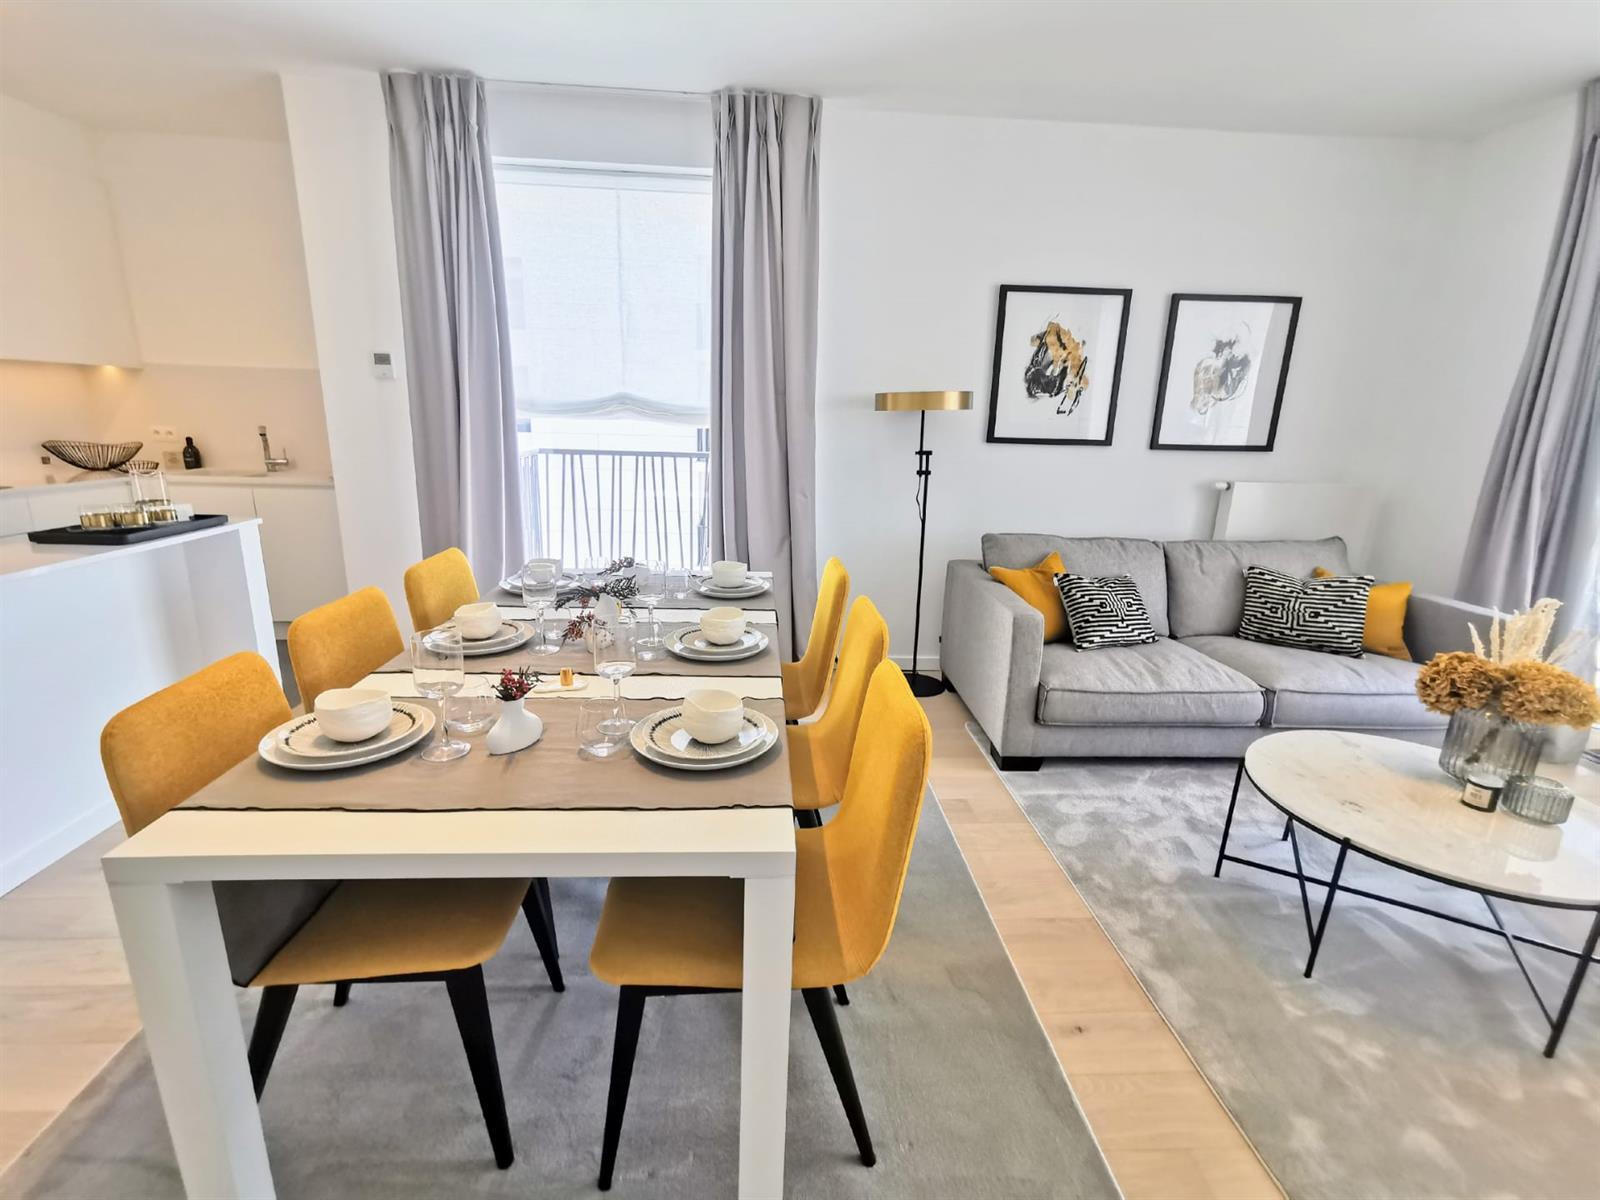 Appartement - Woluwe-Saint-Lambert - #4455516-1